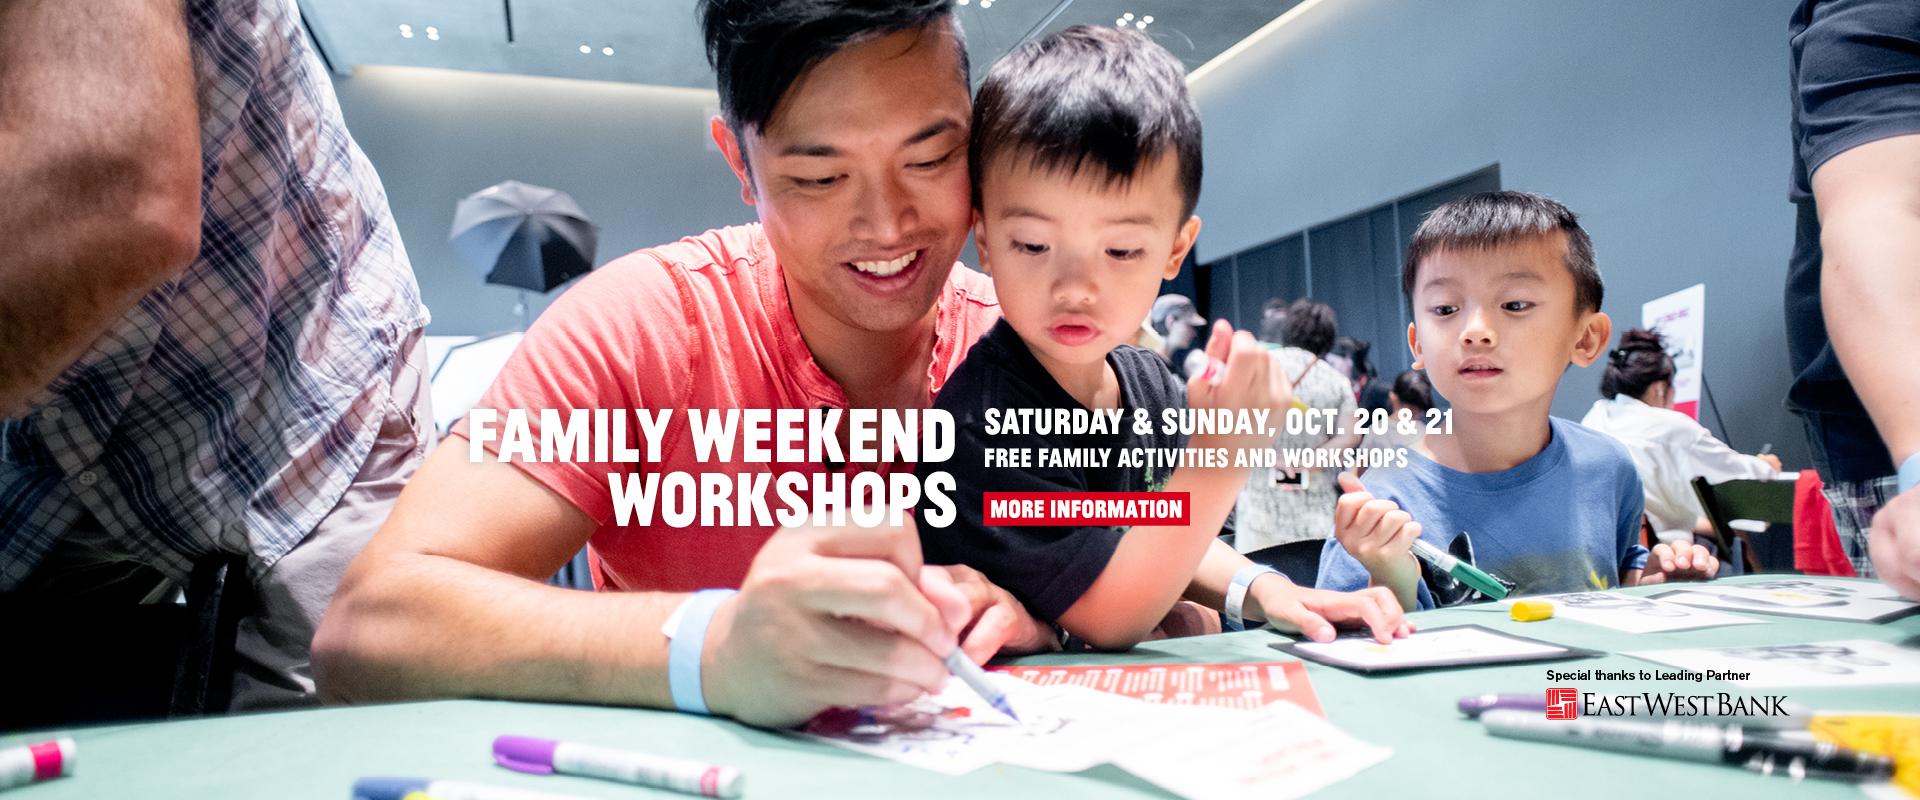 Family Weekend Workshops | October 2018